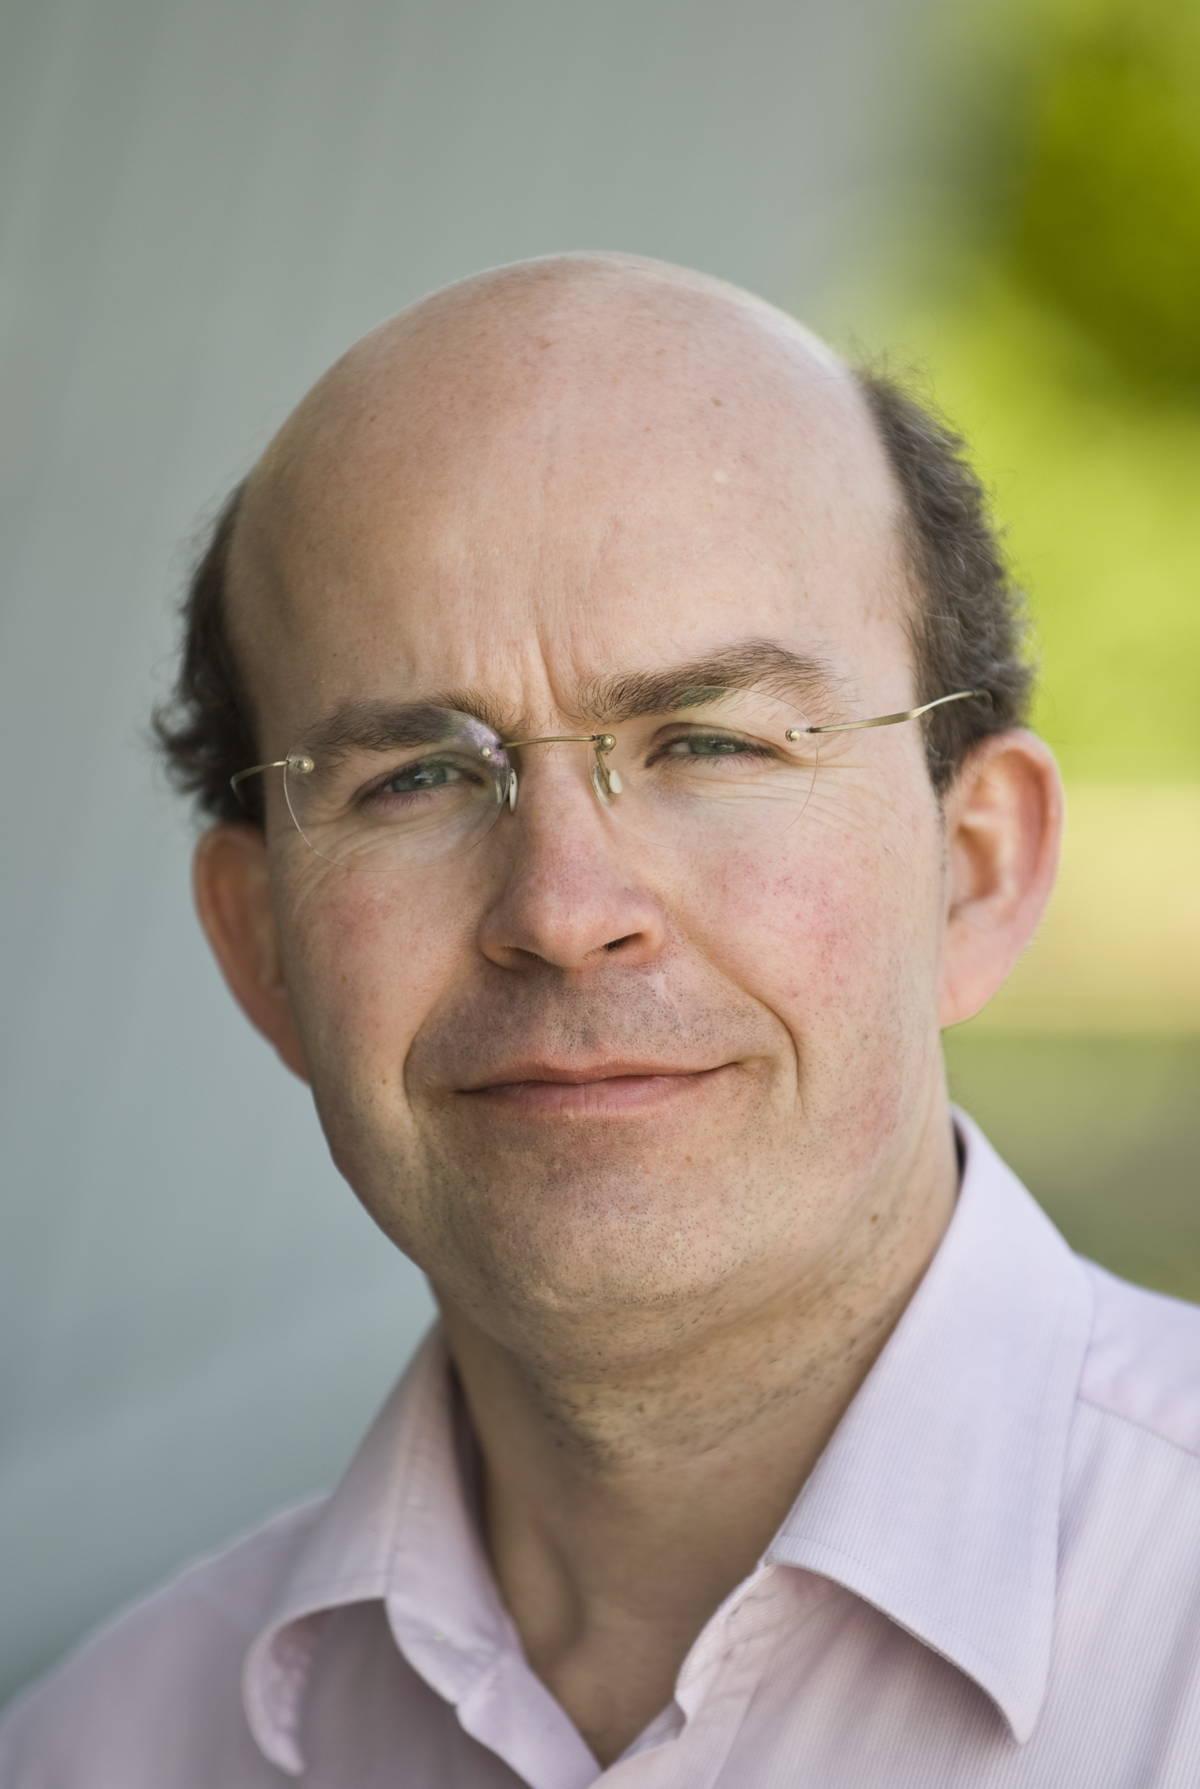 Tim Shuttleworth barrister